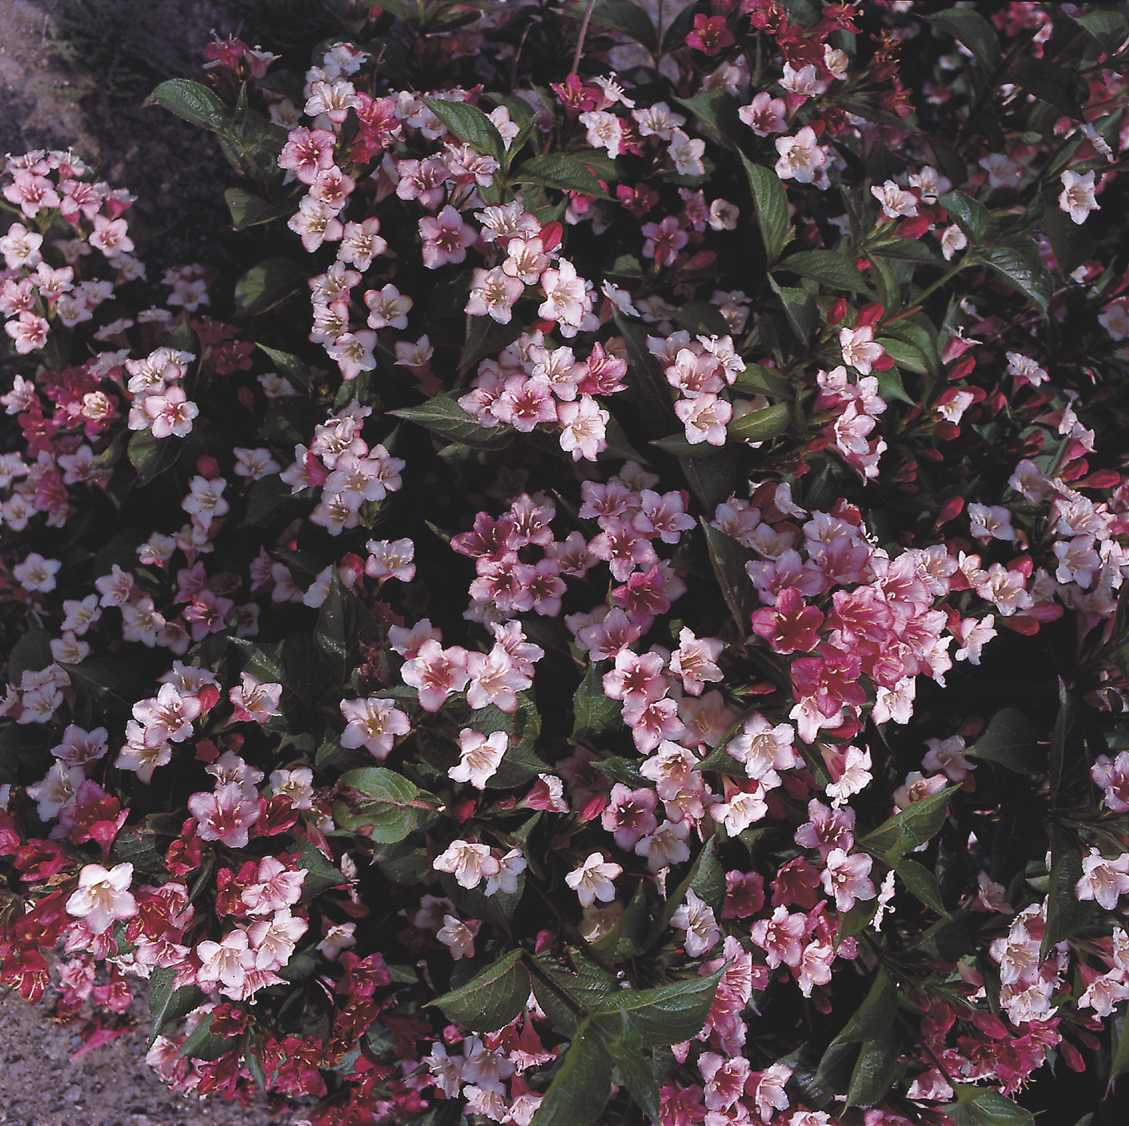 ABELIA grandiflora Kaleidoscope ® at plandorex.com